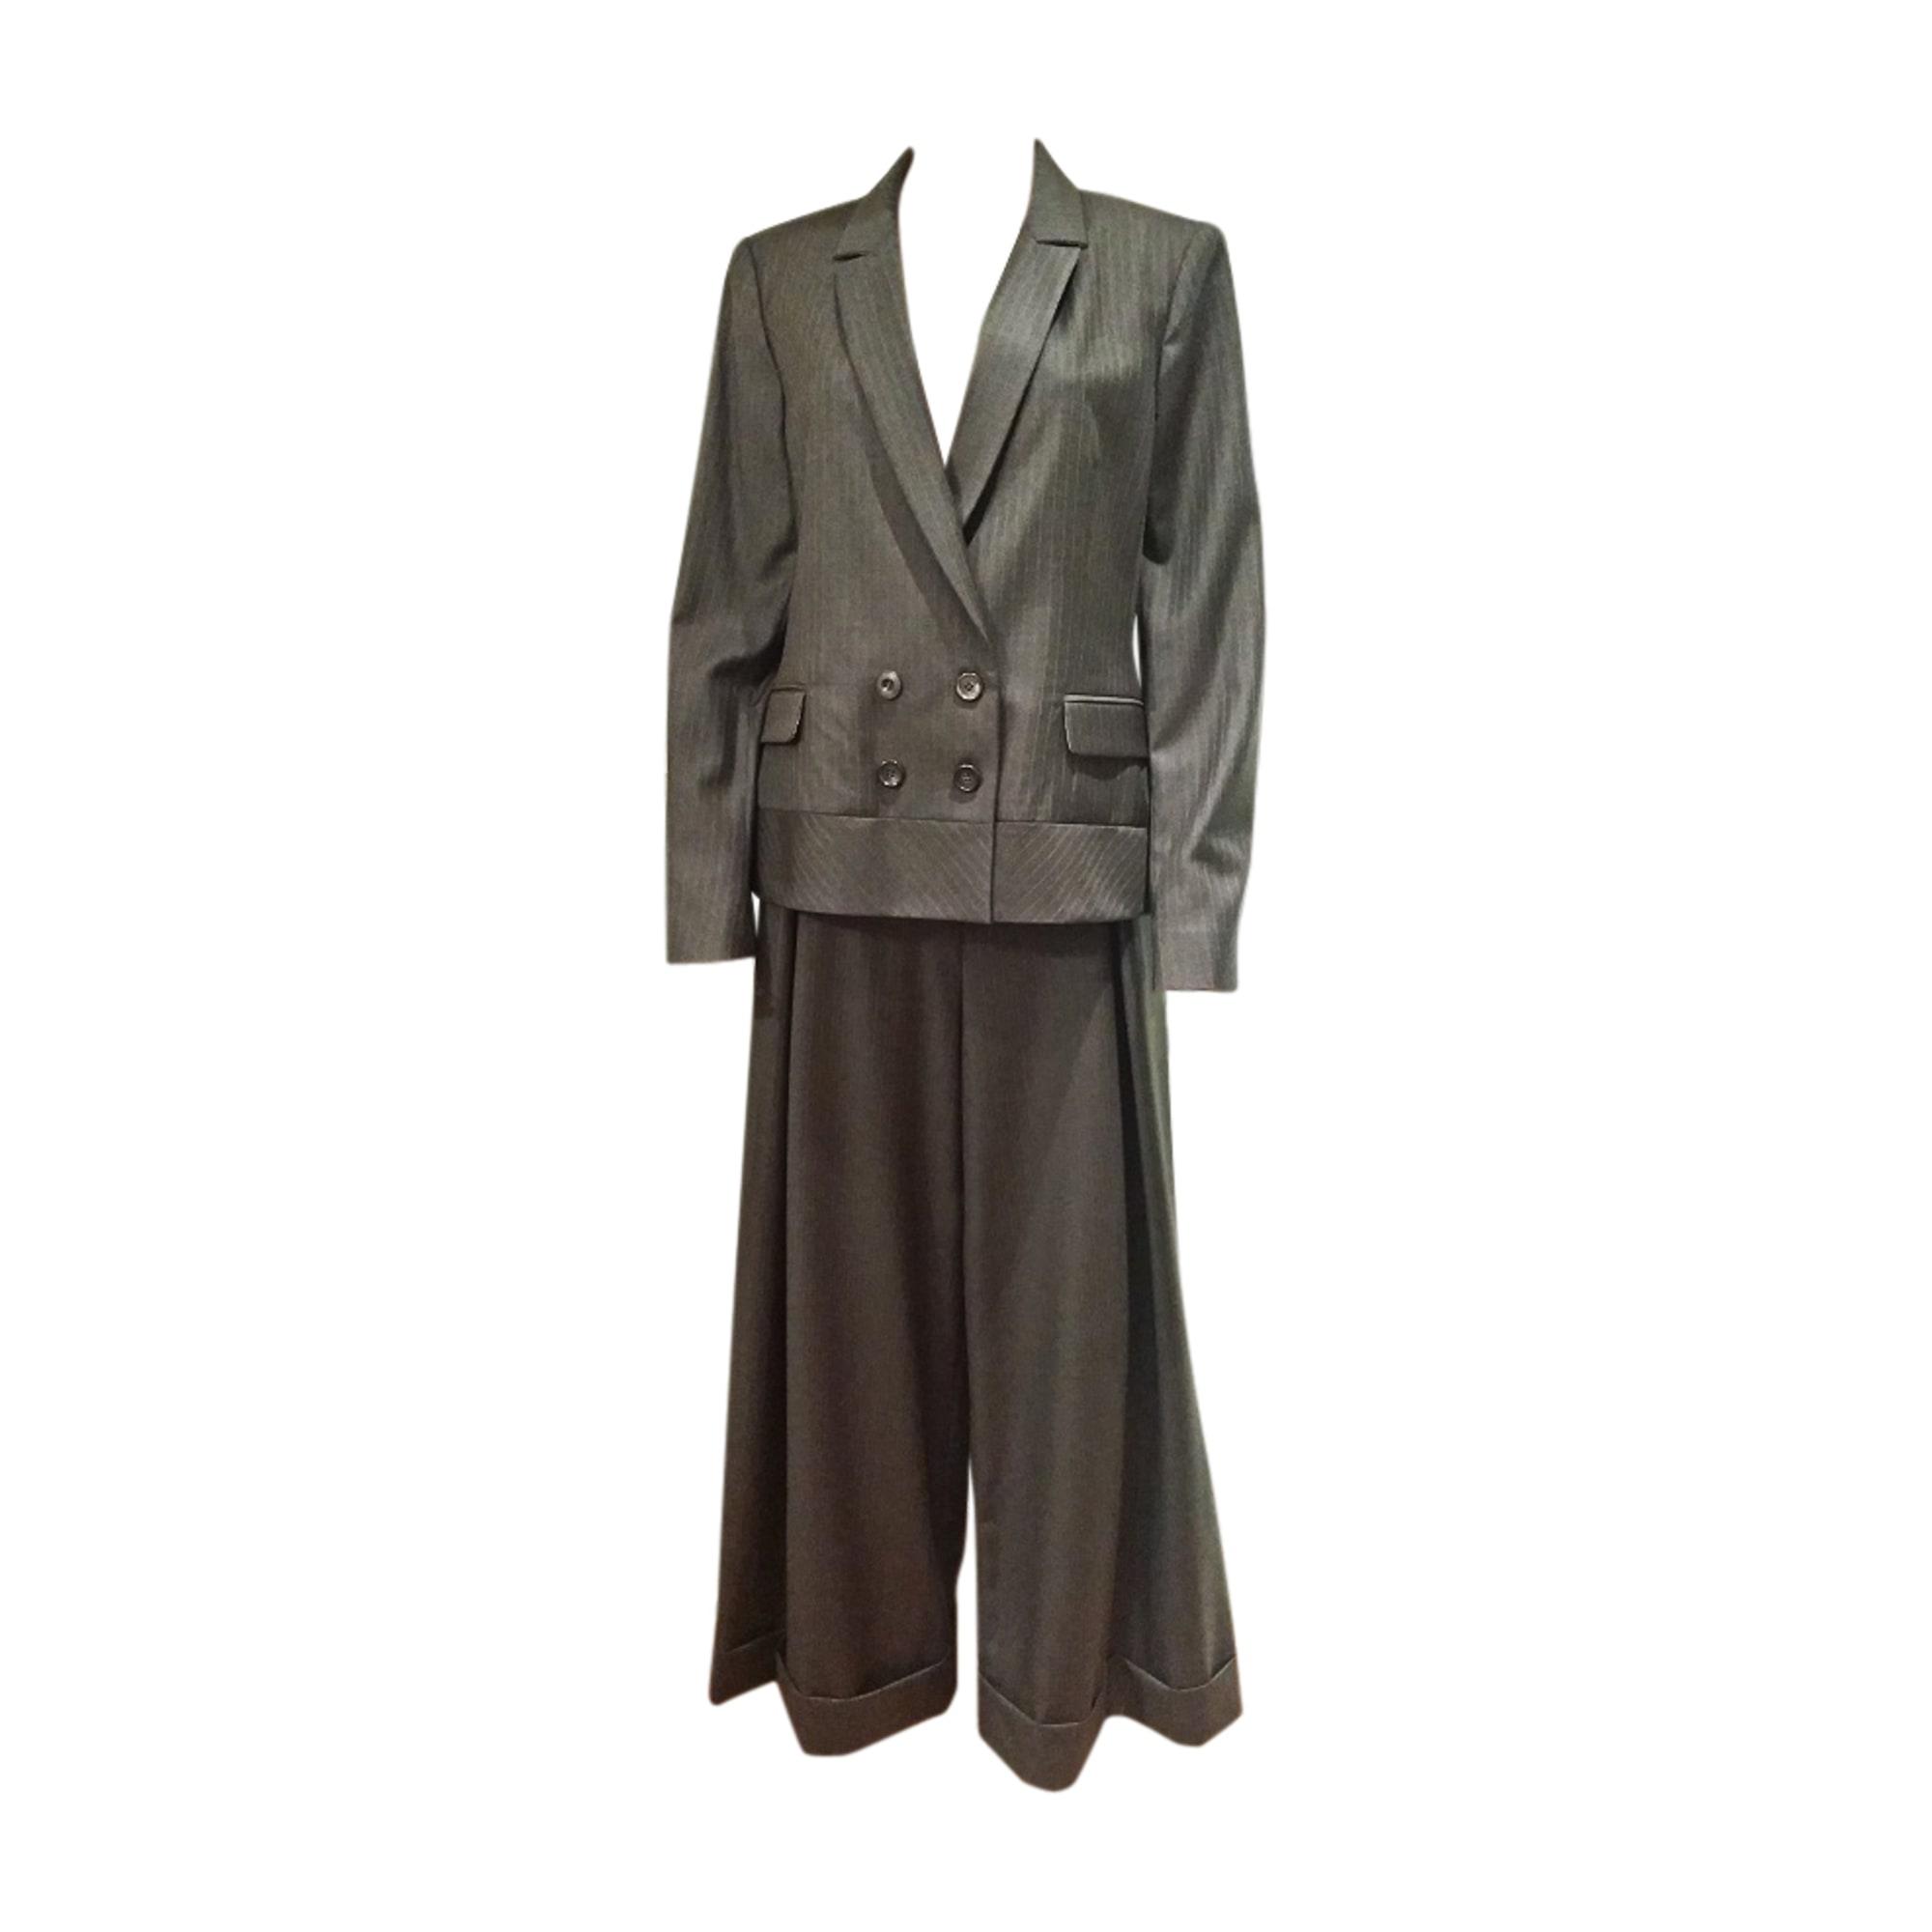 10507c74916 Tailleur pantalon KENZO 46 (XXL) multicouleur - 7910499